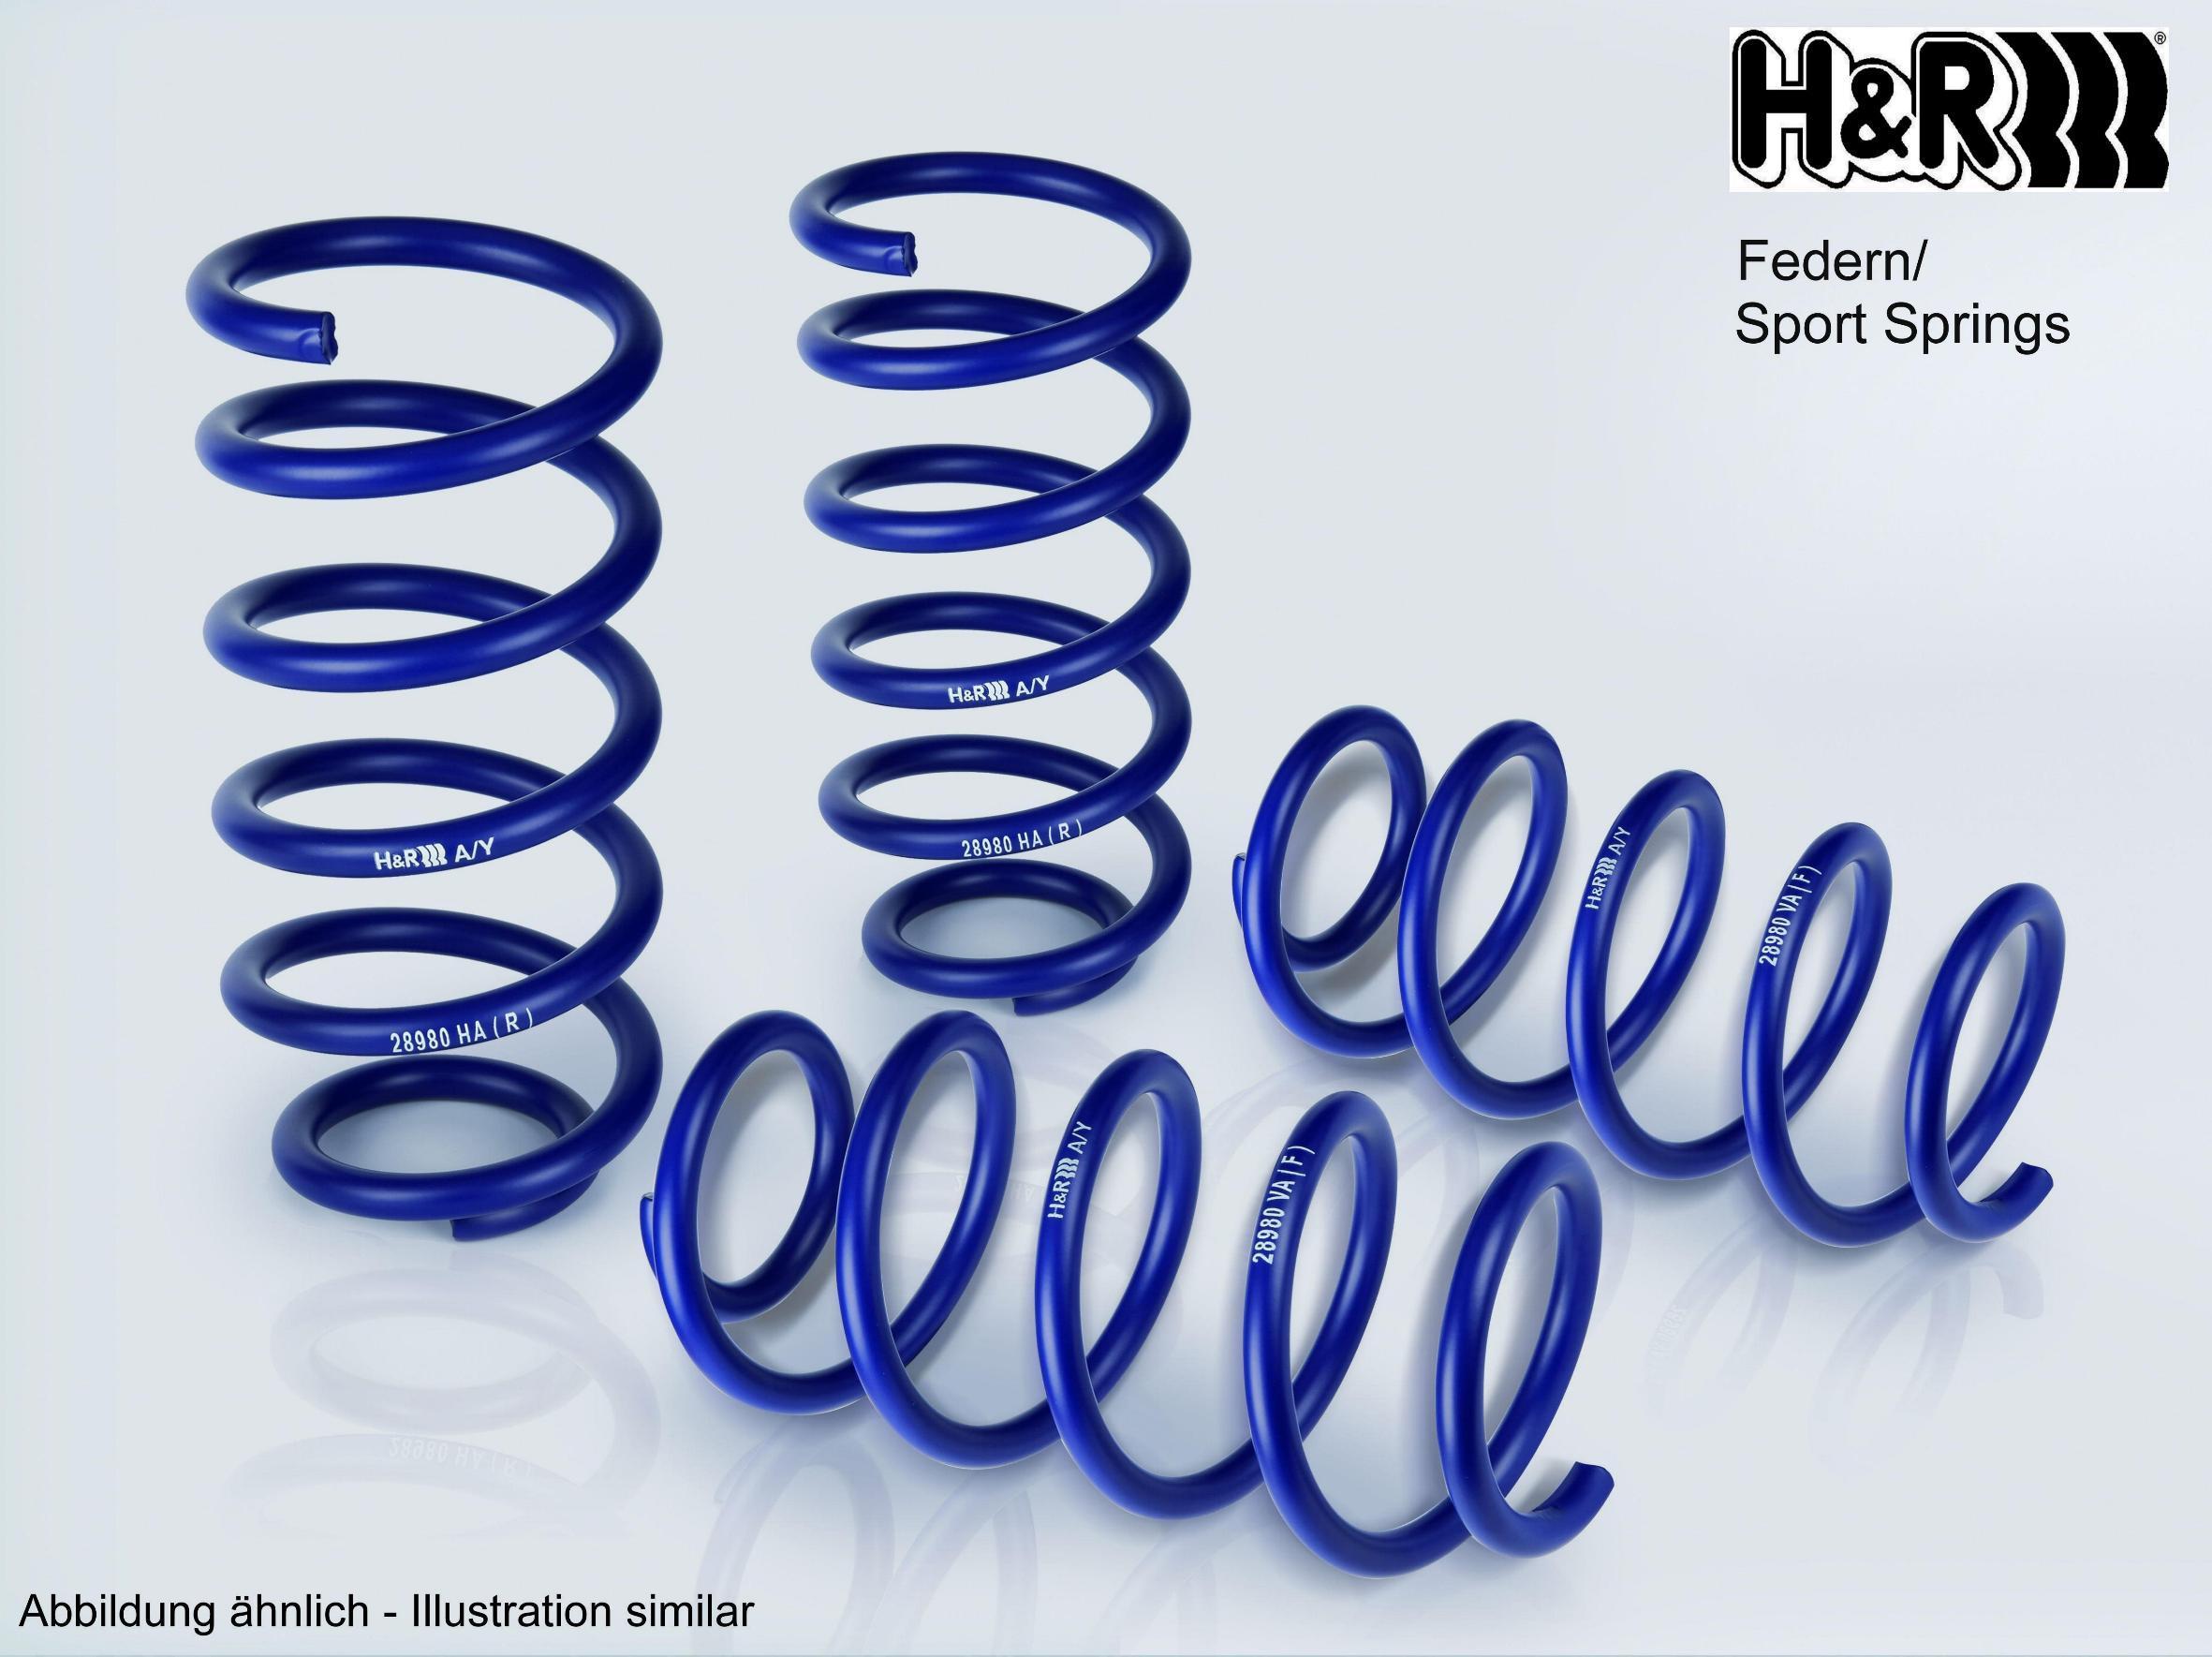 H&R | Fahrwerksatz, Federn 29046-1